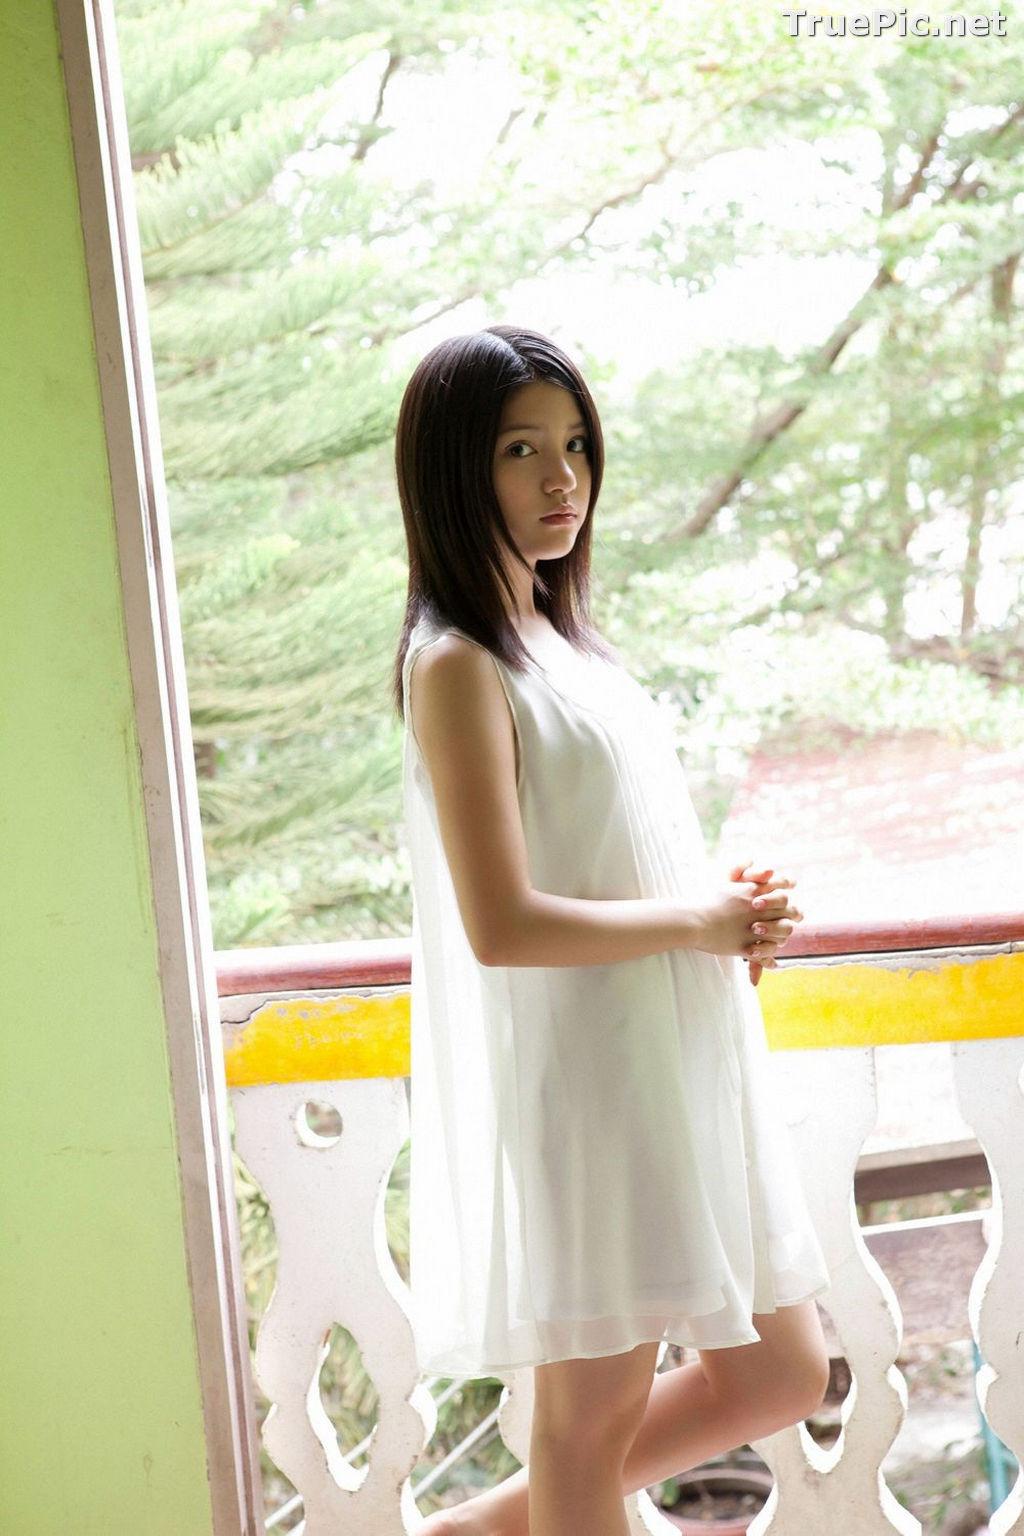 Image [YS Web] Vol.506 - Japanese Actress and Singer - Umika Kawashima - TruePic.net - Picture-10